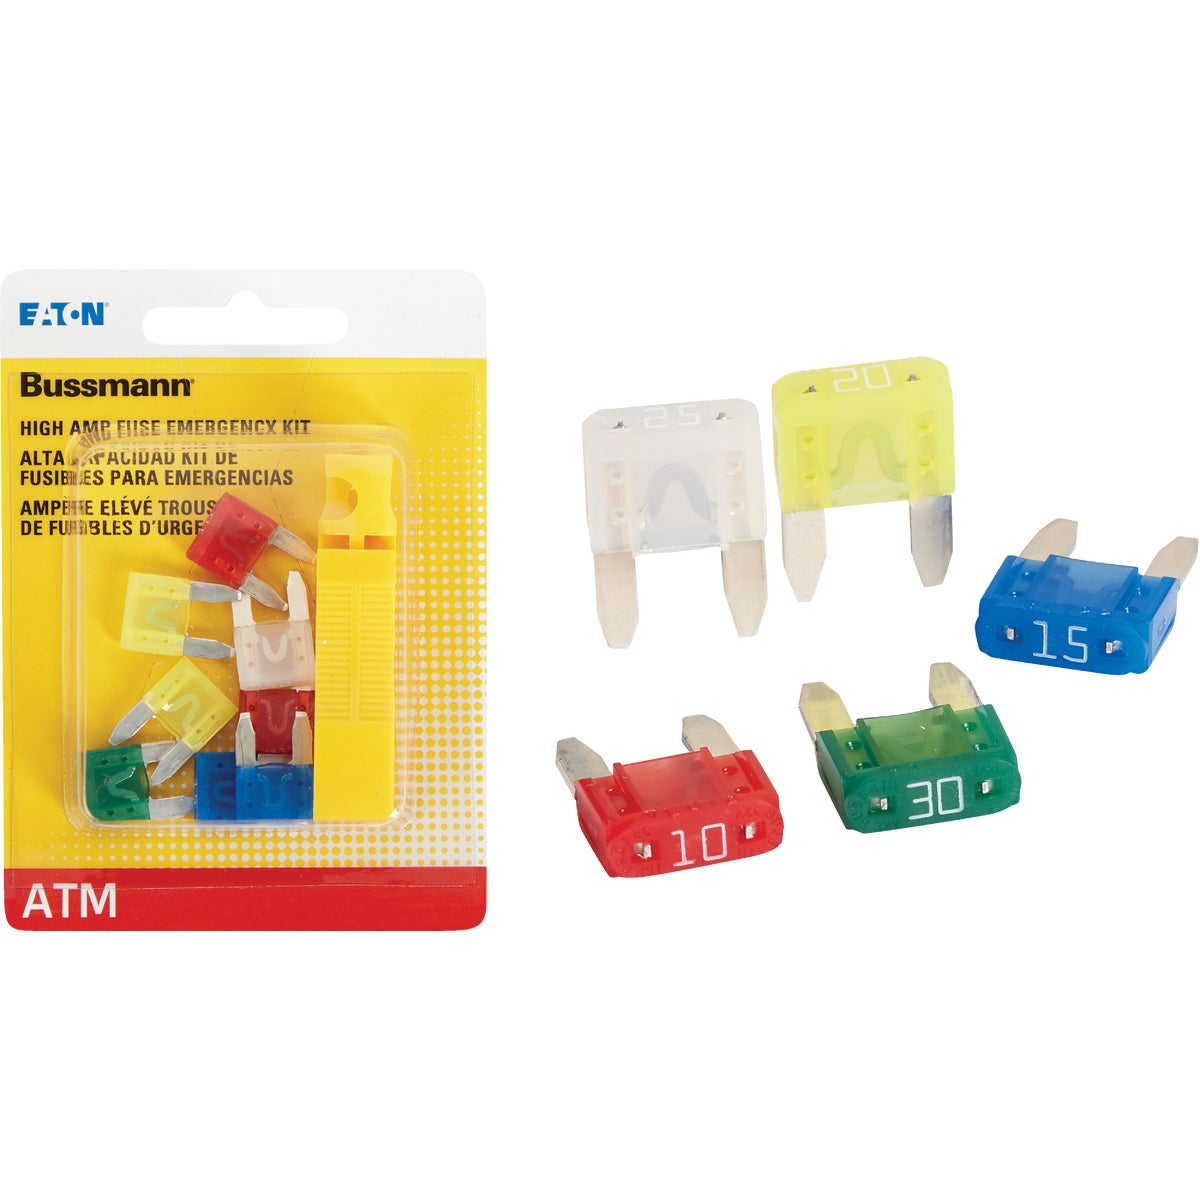 HIGH AMP ATM FUSE KIT - BP/ATM-AH8-RPP by Bussmann Cooper